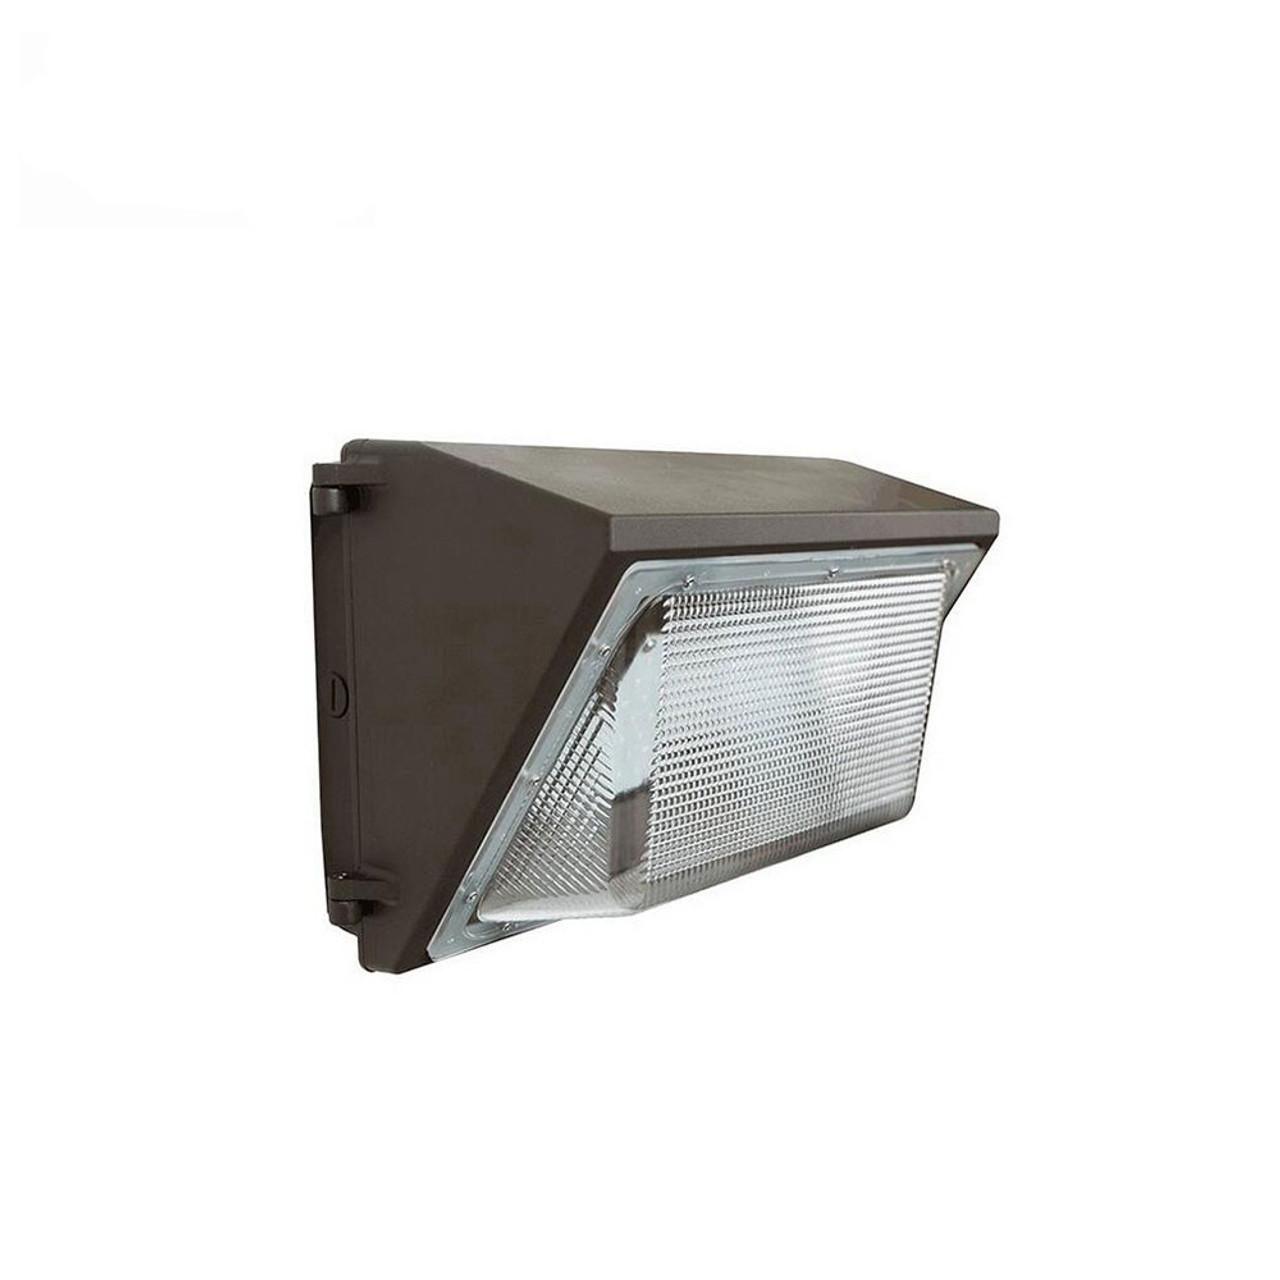 LED Wall Pack, 120 Watt, 14400 lumen, 5000 Kelvin, 100-277 volt, UL and DLC Listed